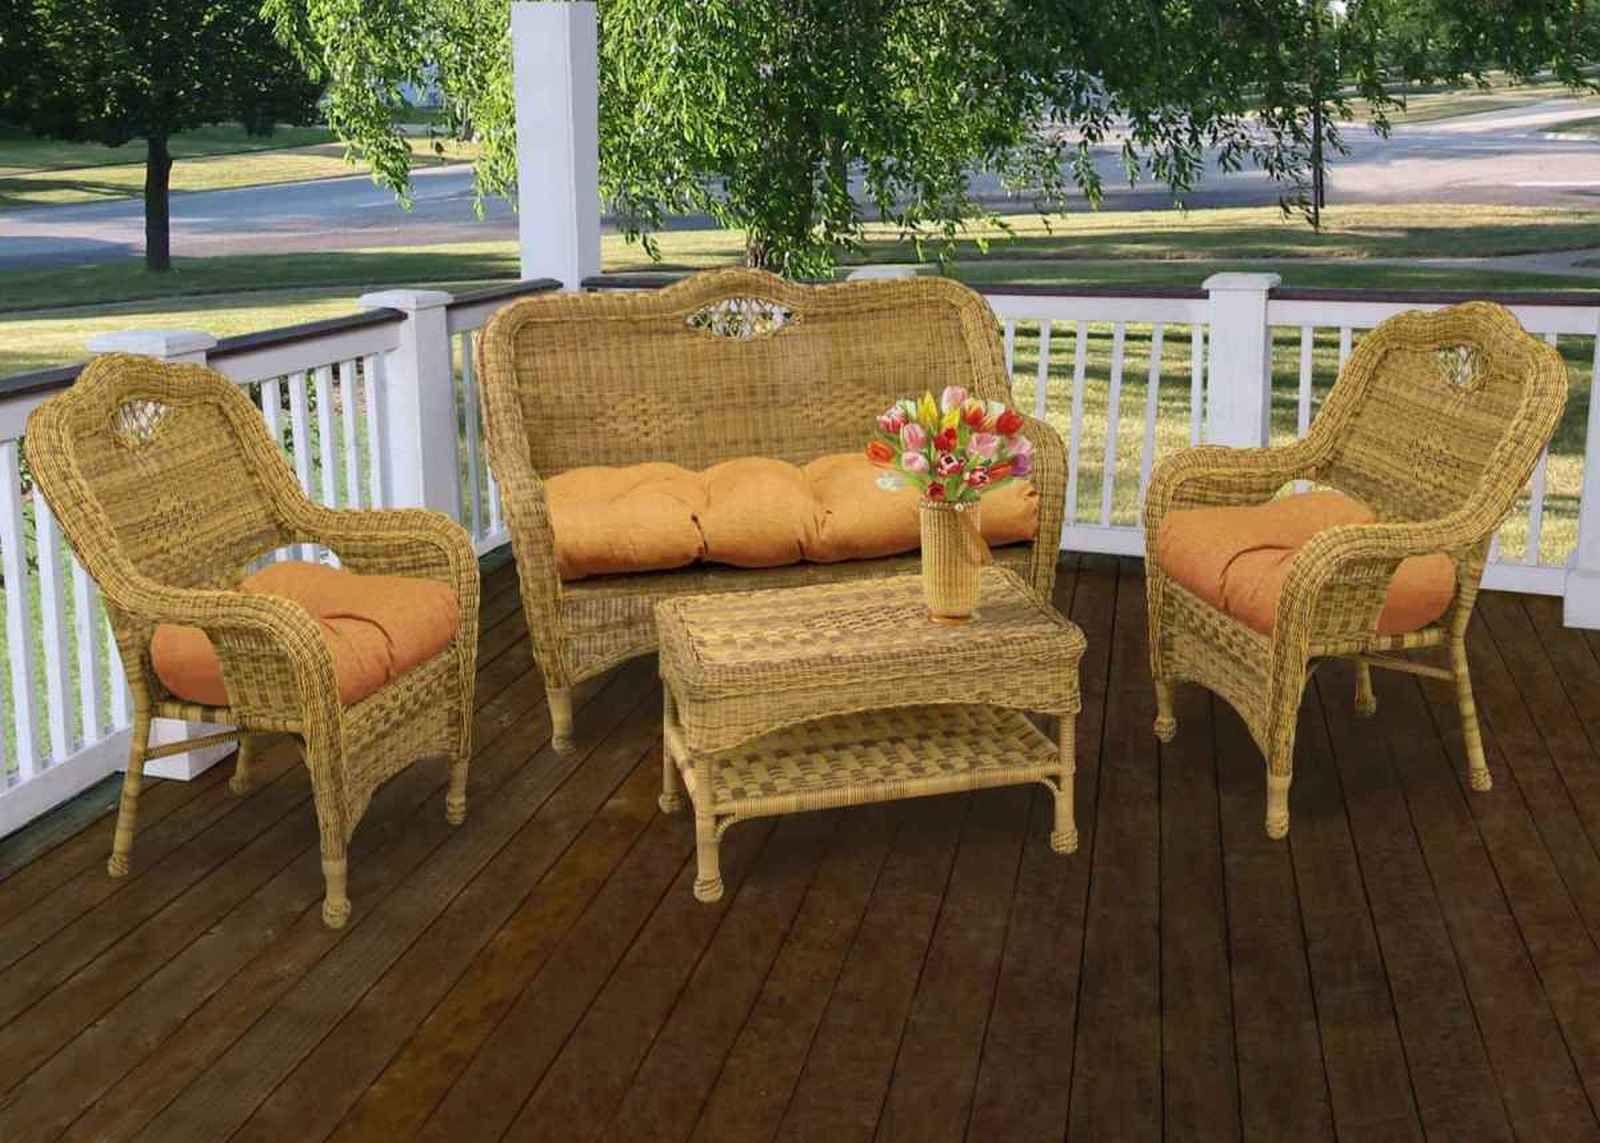 Outdoor Wicker Patio Furniture patio furniture in wicker | minimalist home design | pinterest